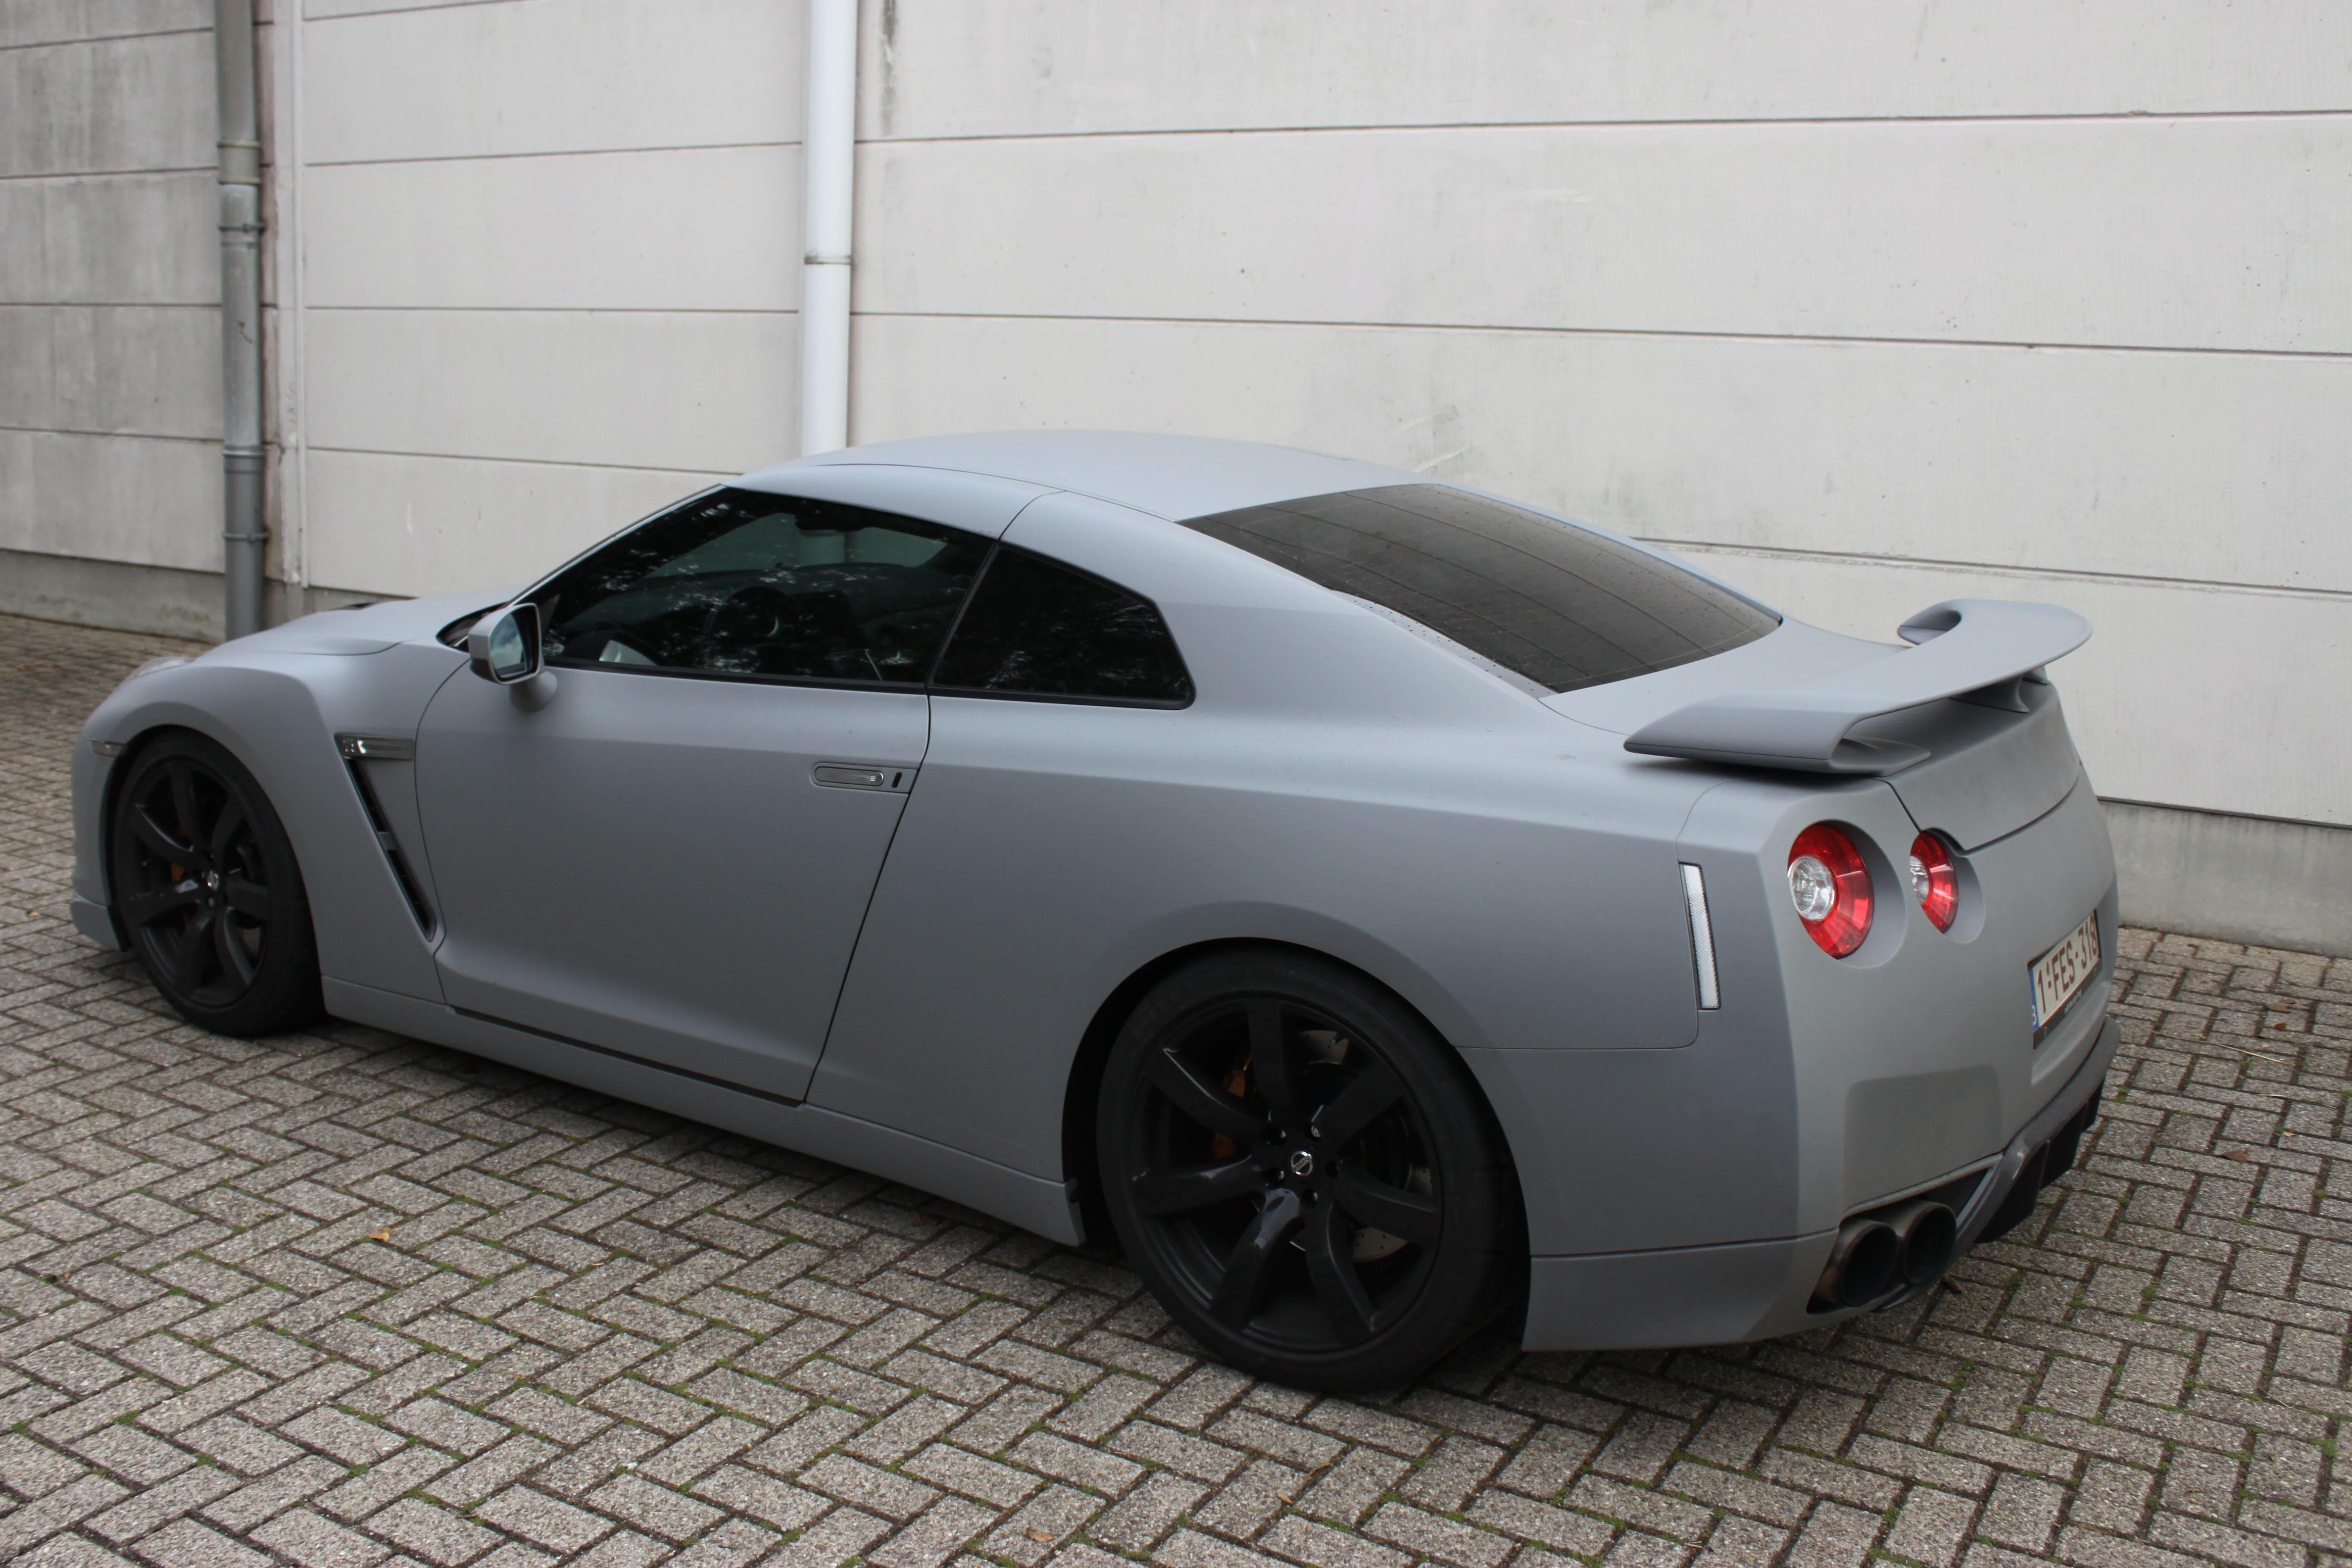 Nissan GT-R met Mat Grijze Wrap, Carwrapping door Wrapmyride.nu Foto-nr:6561, ©2021